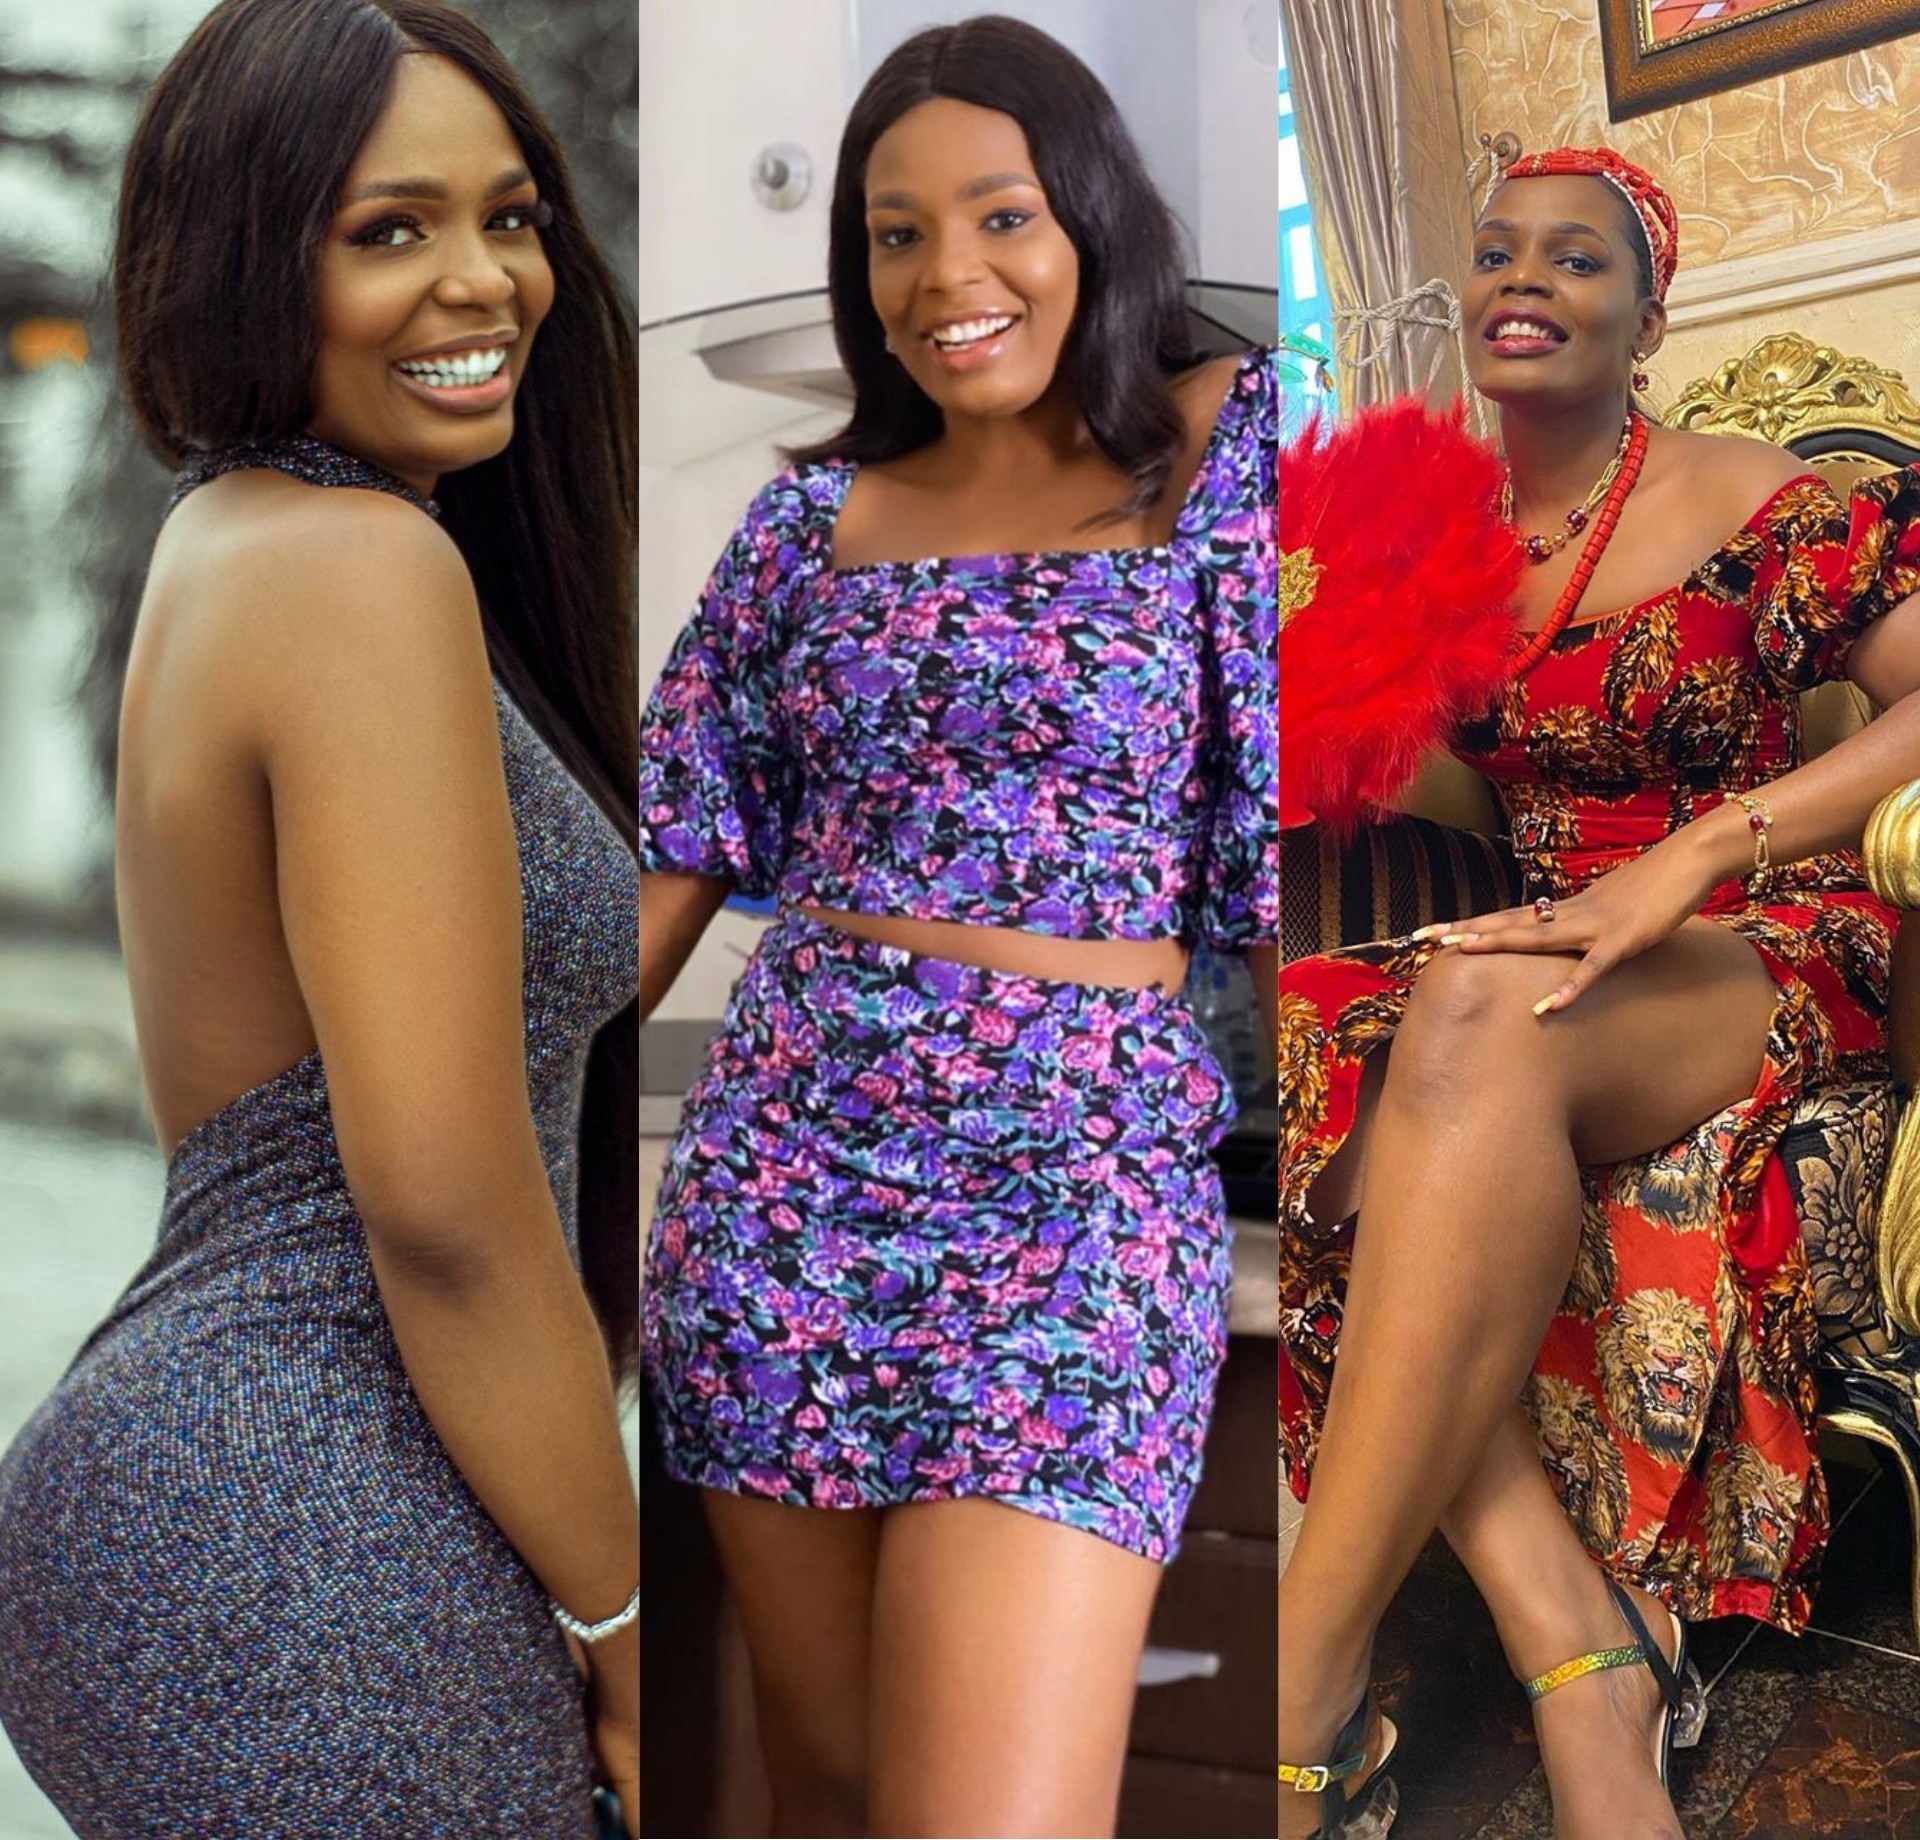 'I need my old life back' BBNaija's Kaisha laments bitterly on keeping up with celebrity status